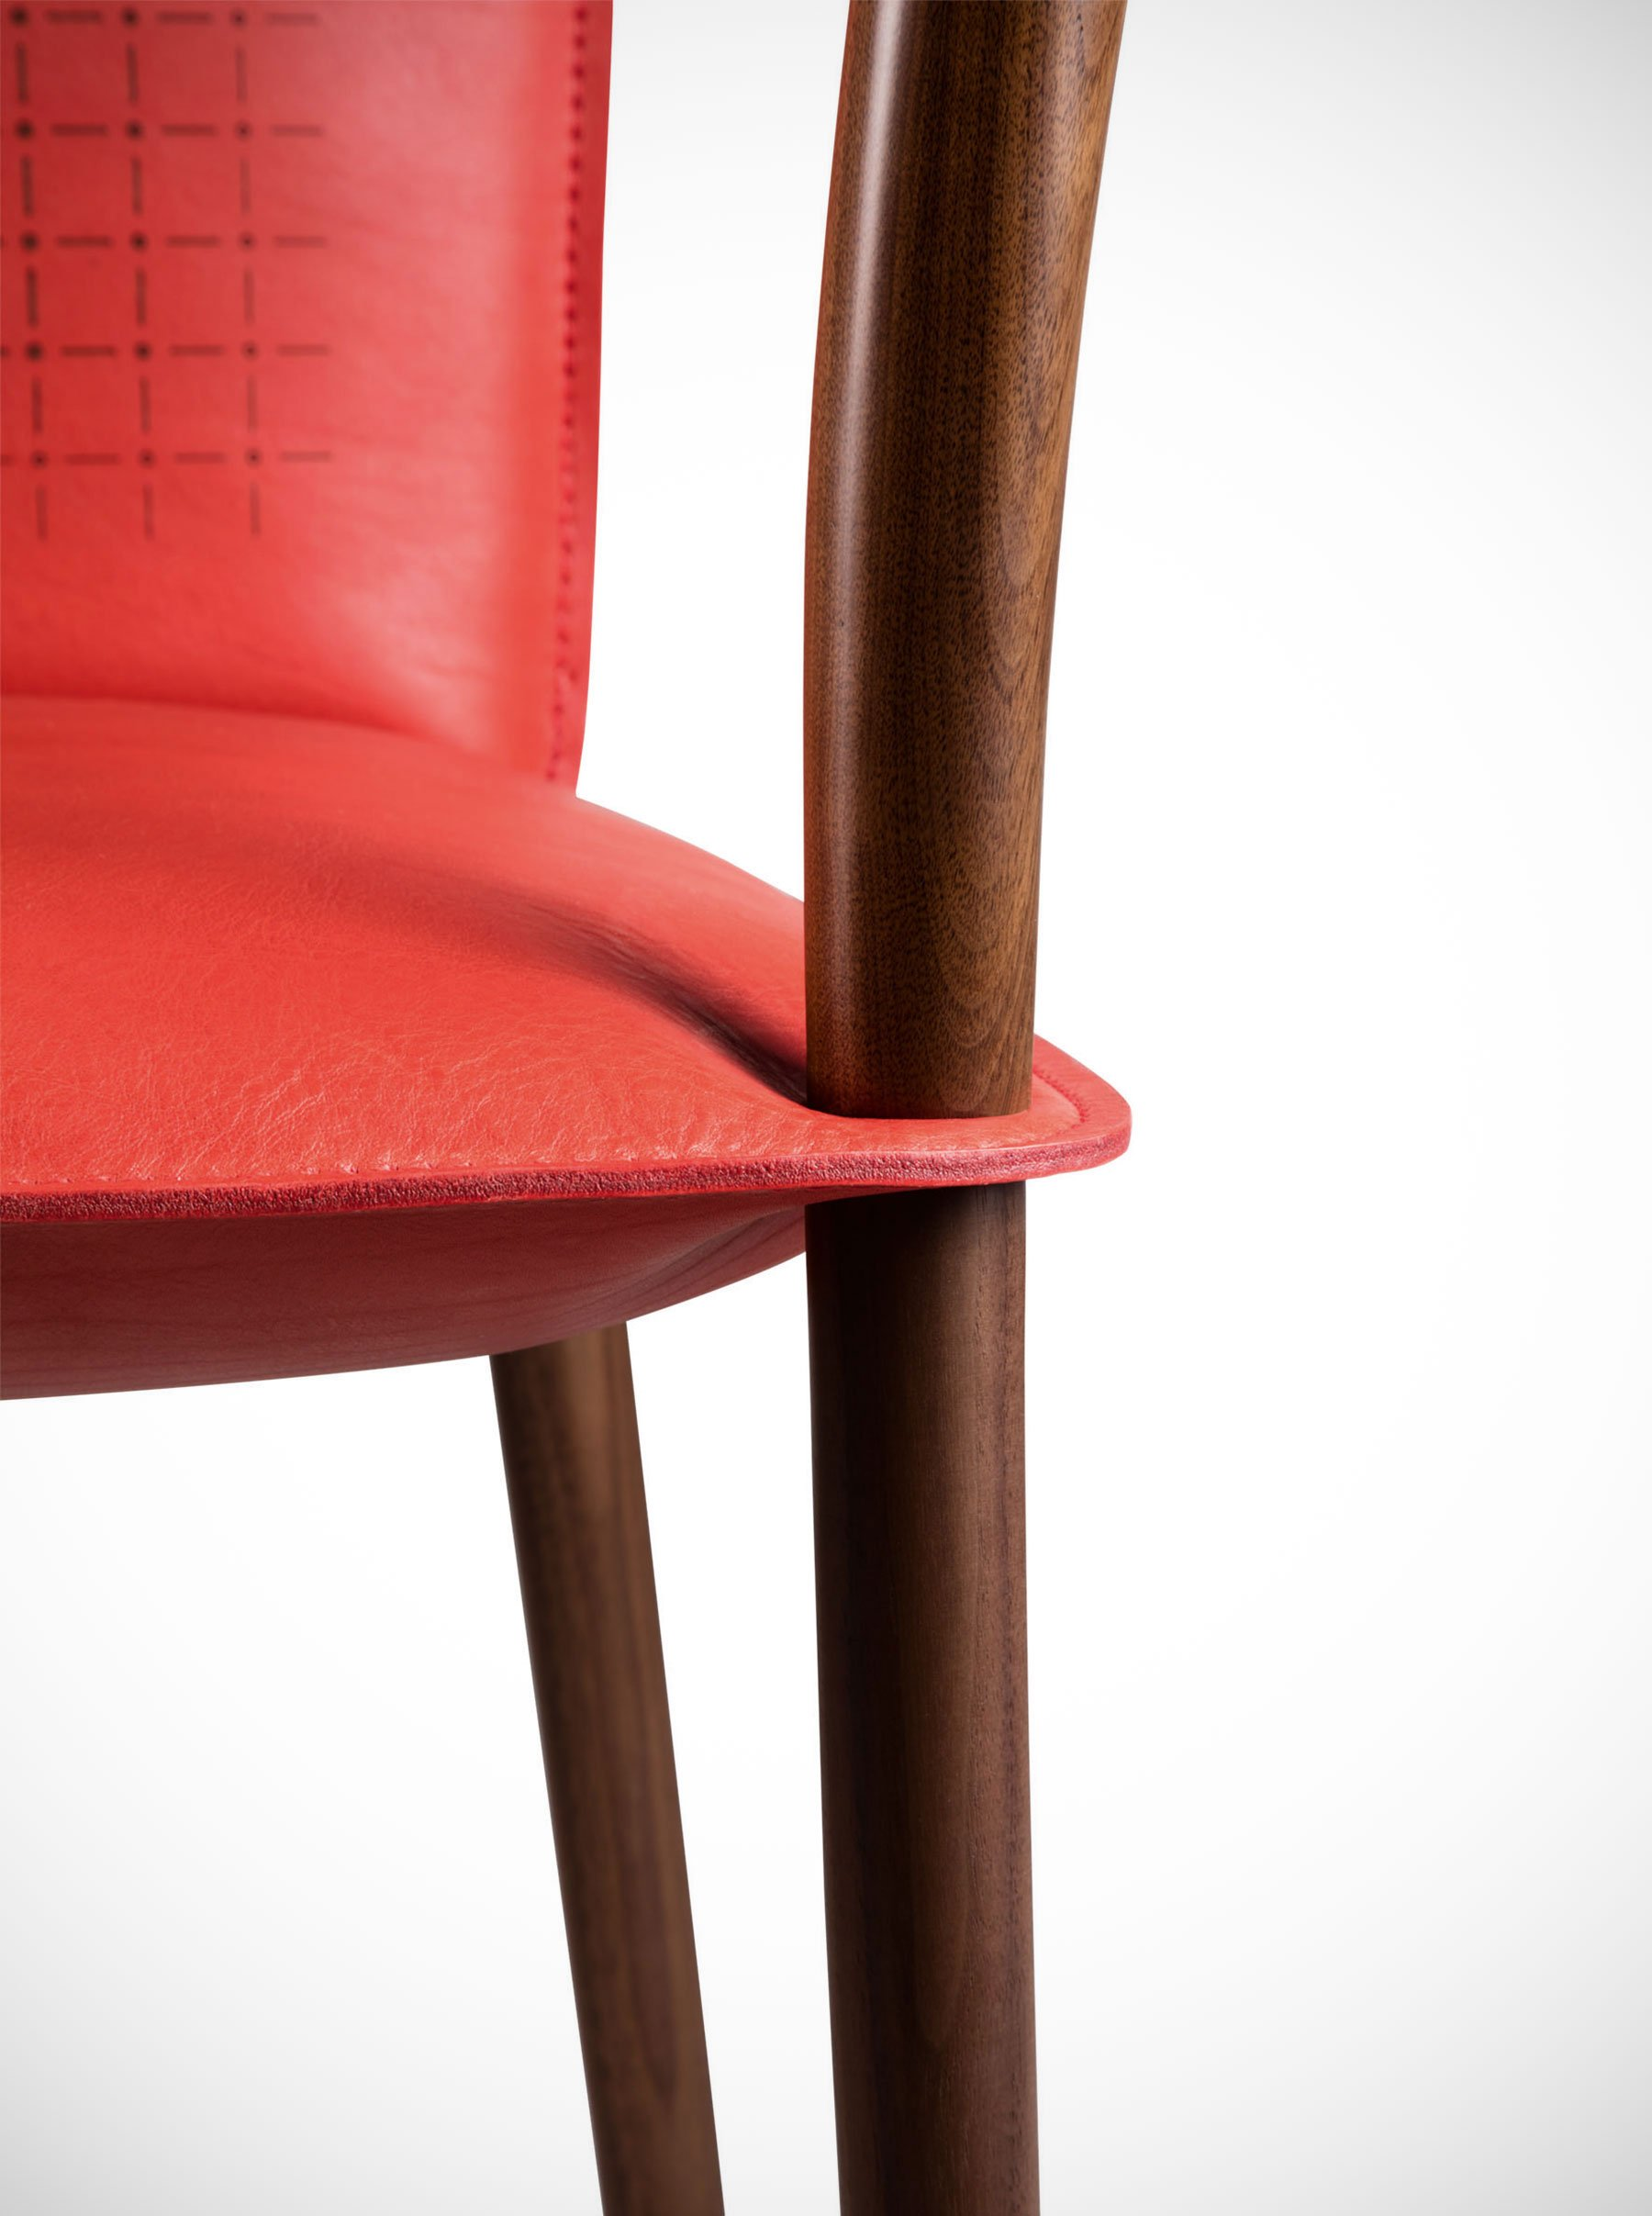 Atena Seat & Armchair By Alessandro Zambelli